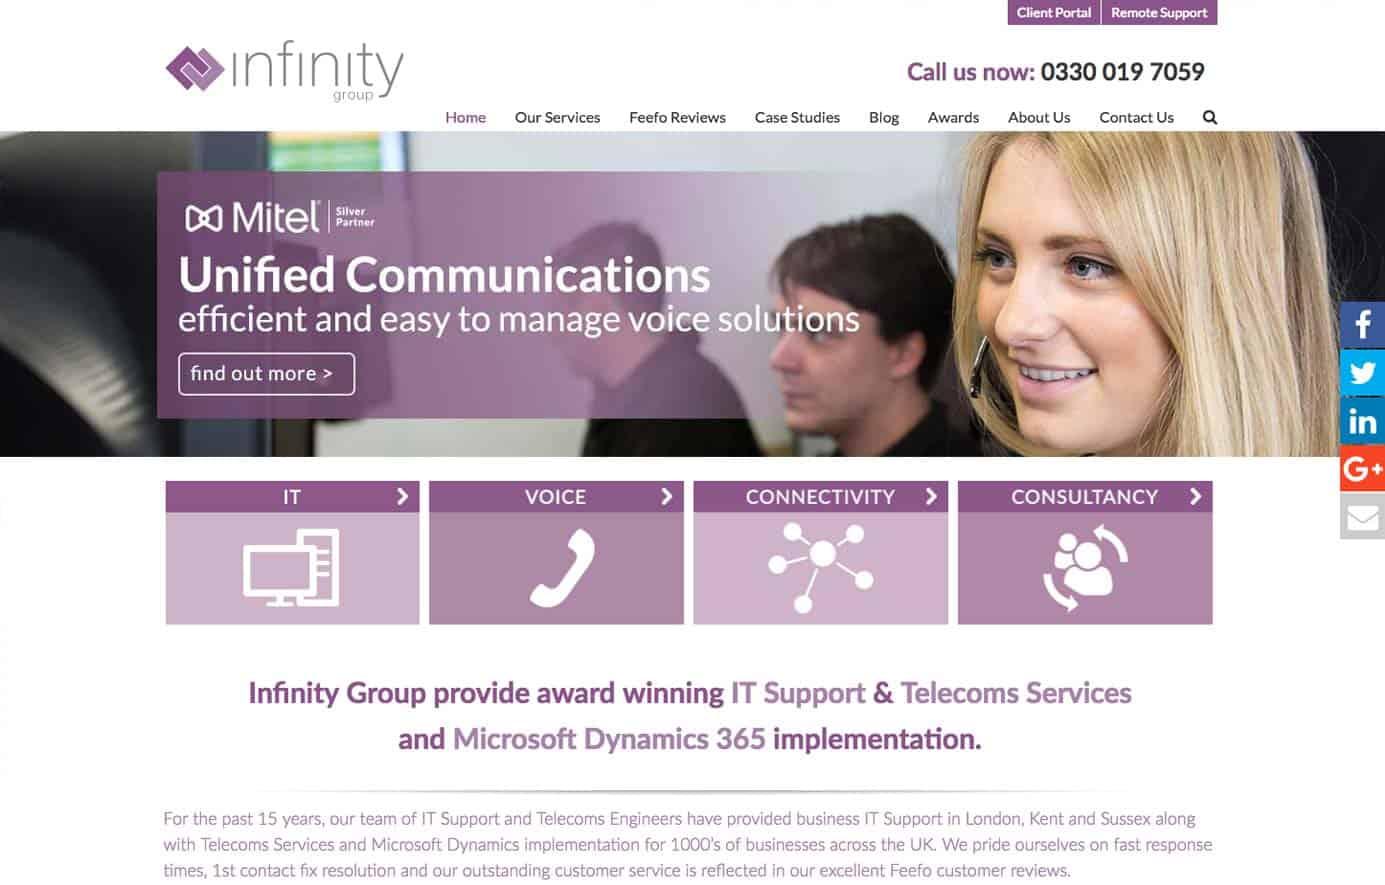 Infinity Group home web design